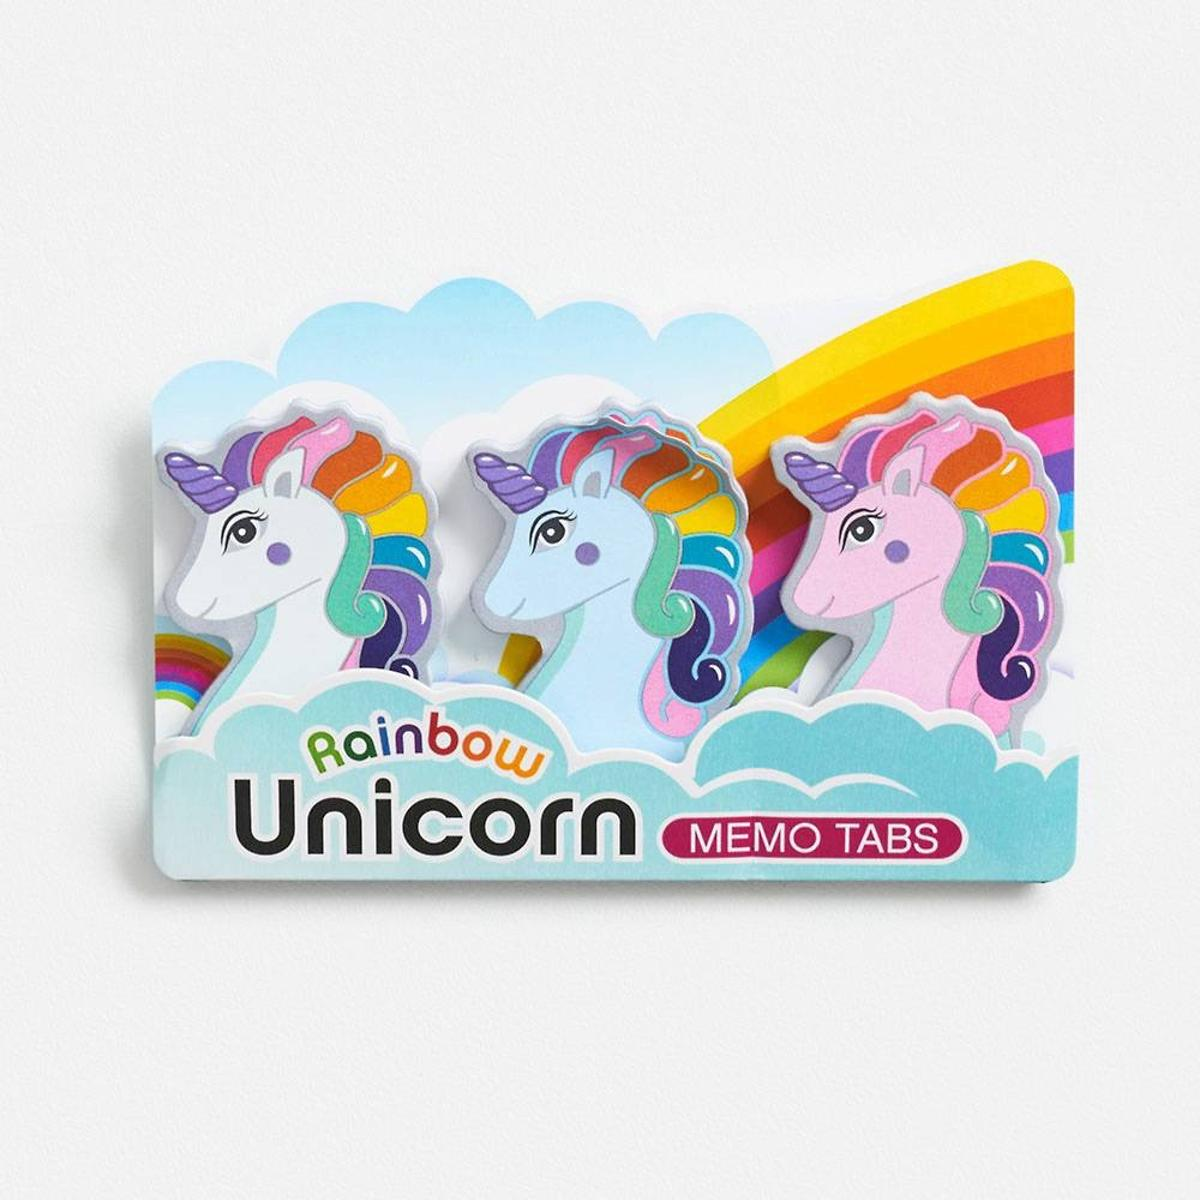 Rainbow Unicorn Memo Tabs